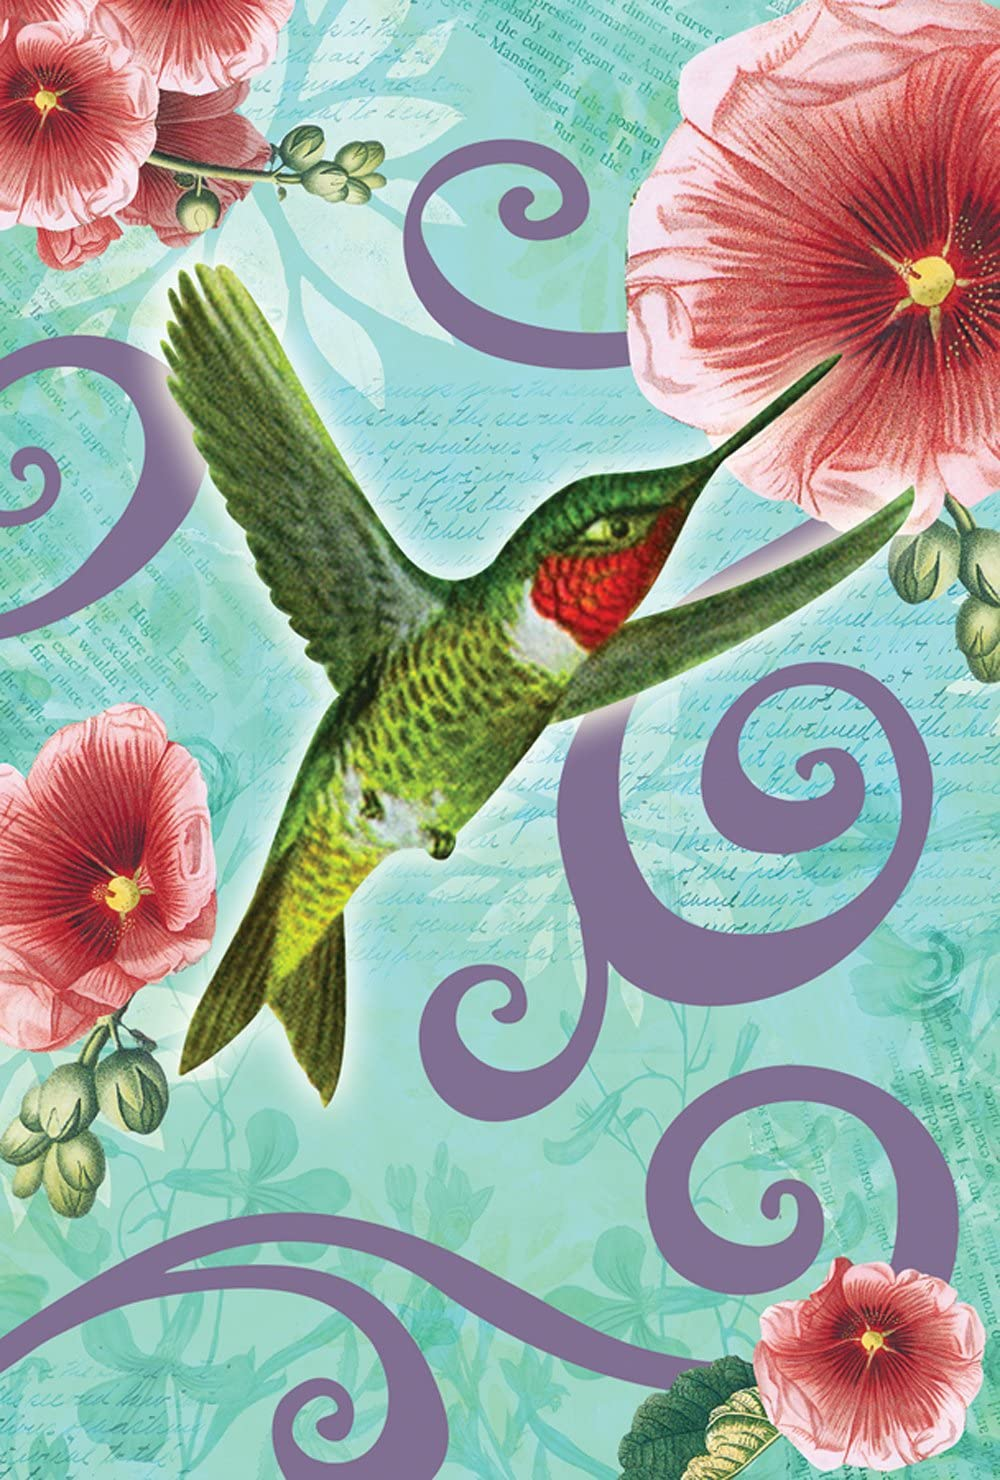 Toland Home Garden Ruby Throated Hummingbird 12.5 x 18 Inch Decorative Spring Flower Flying Bird Garden Flag